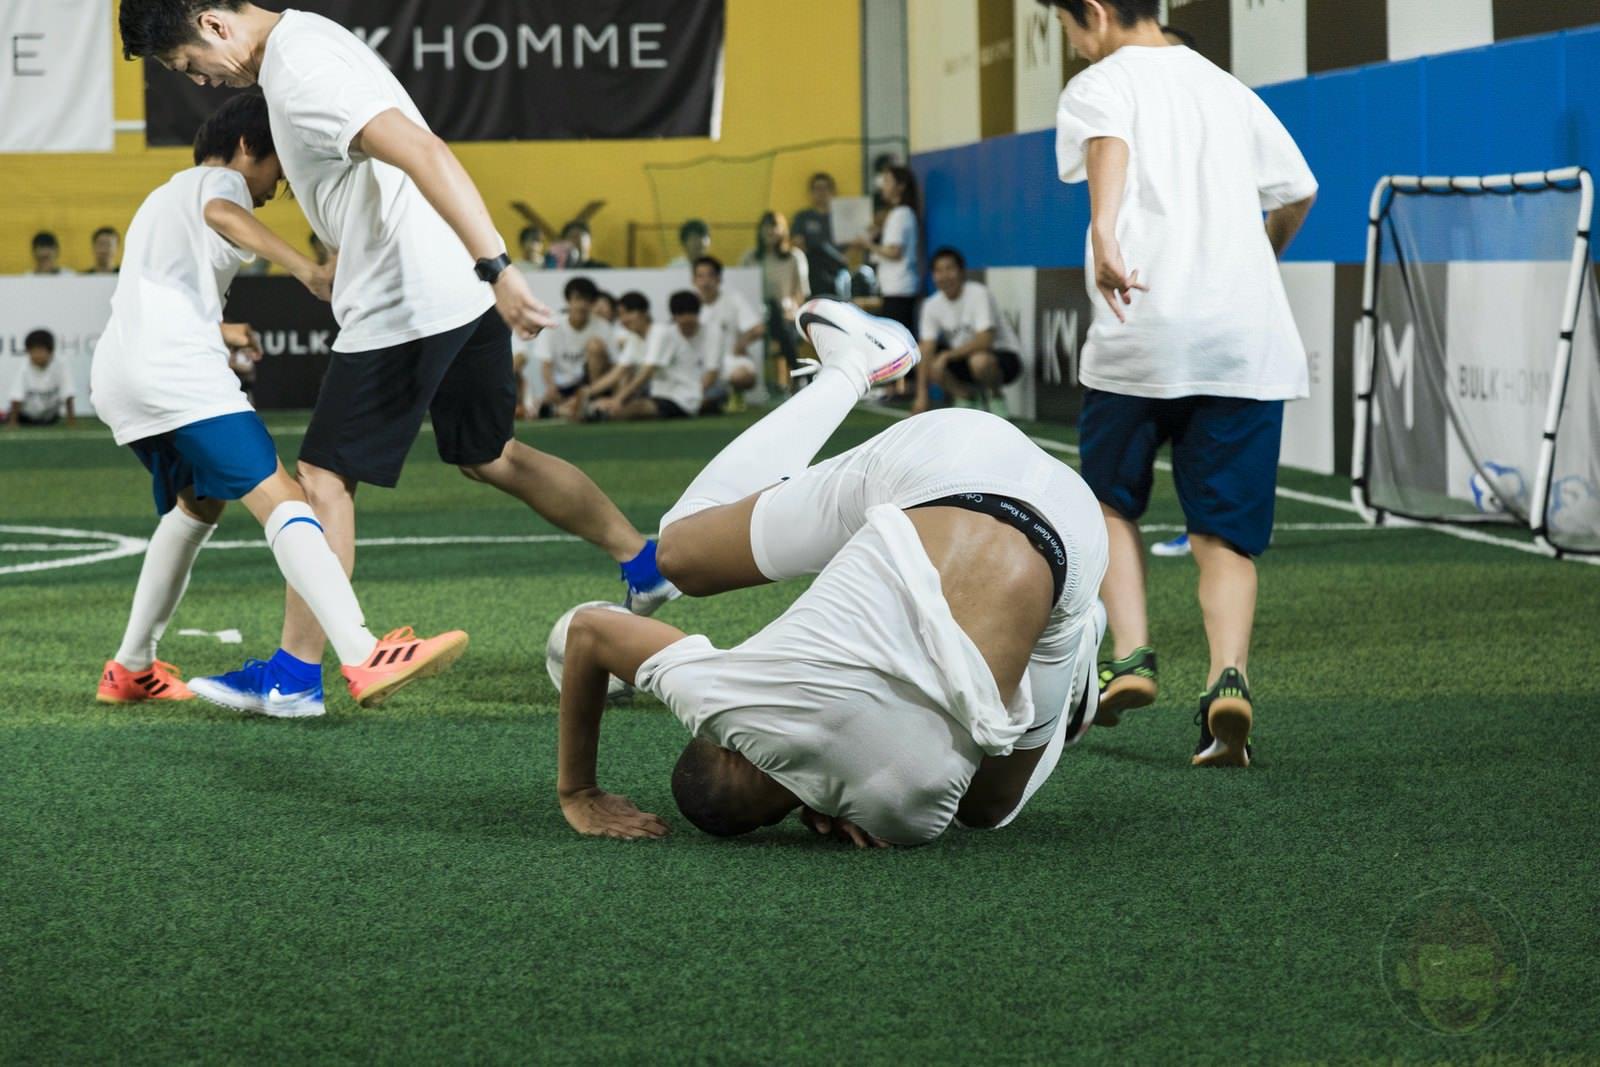 Kylian Mbappé plays soccer with kids 21